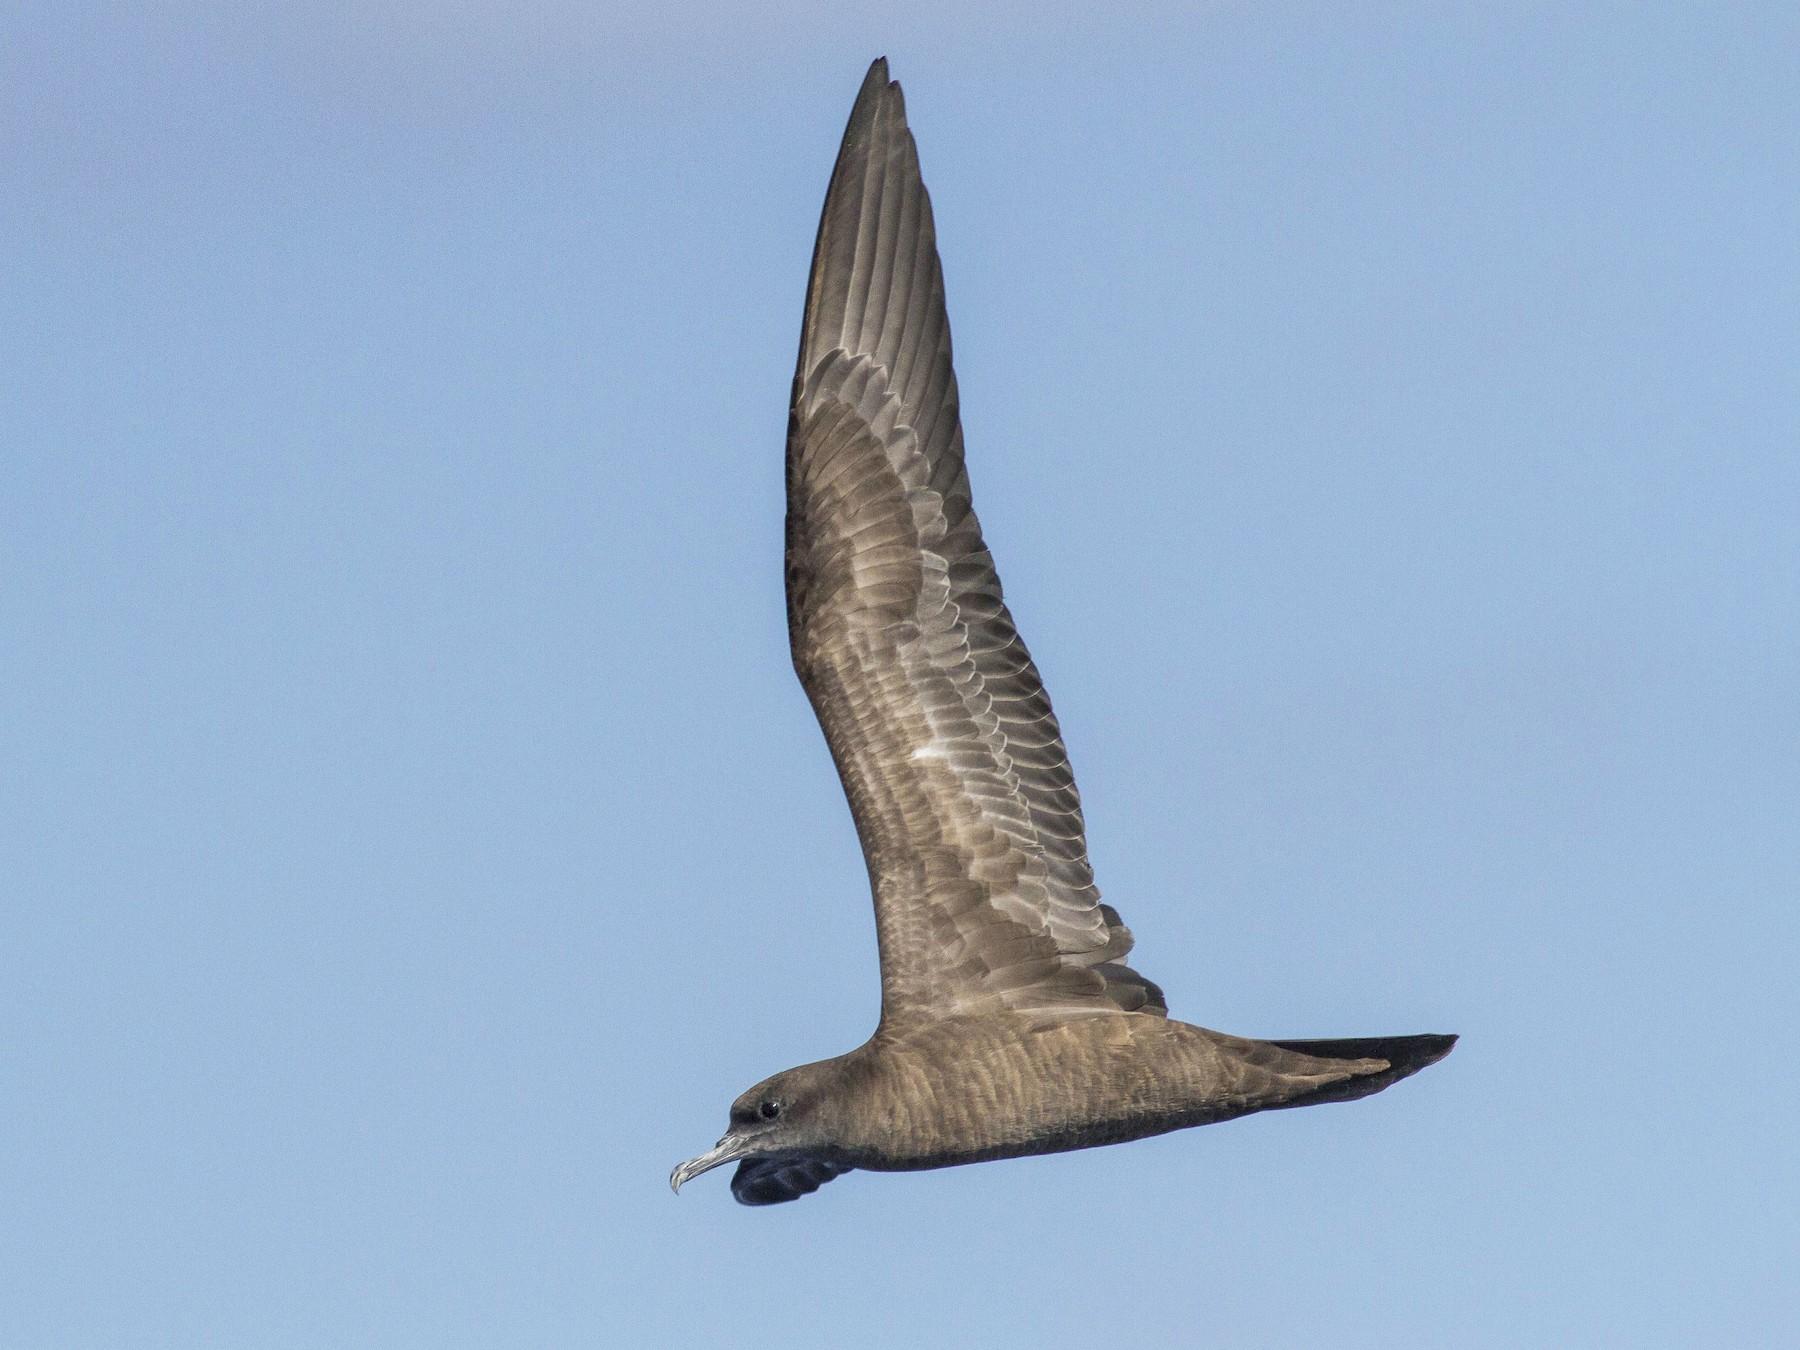 Wedge-tailed Shearwater - Jacob Drucker